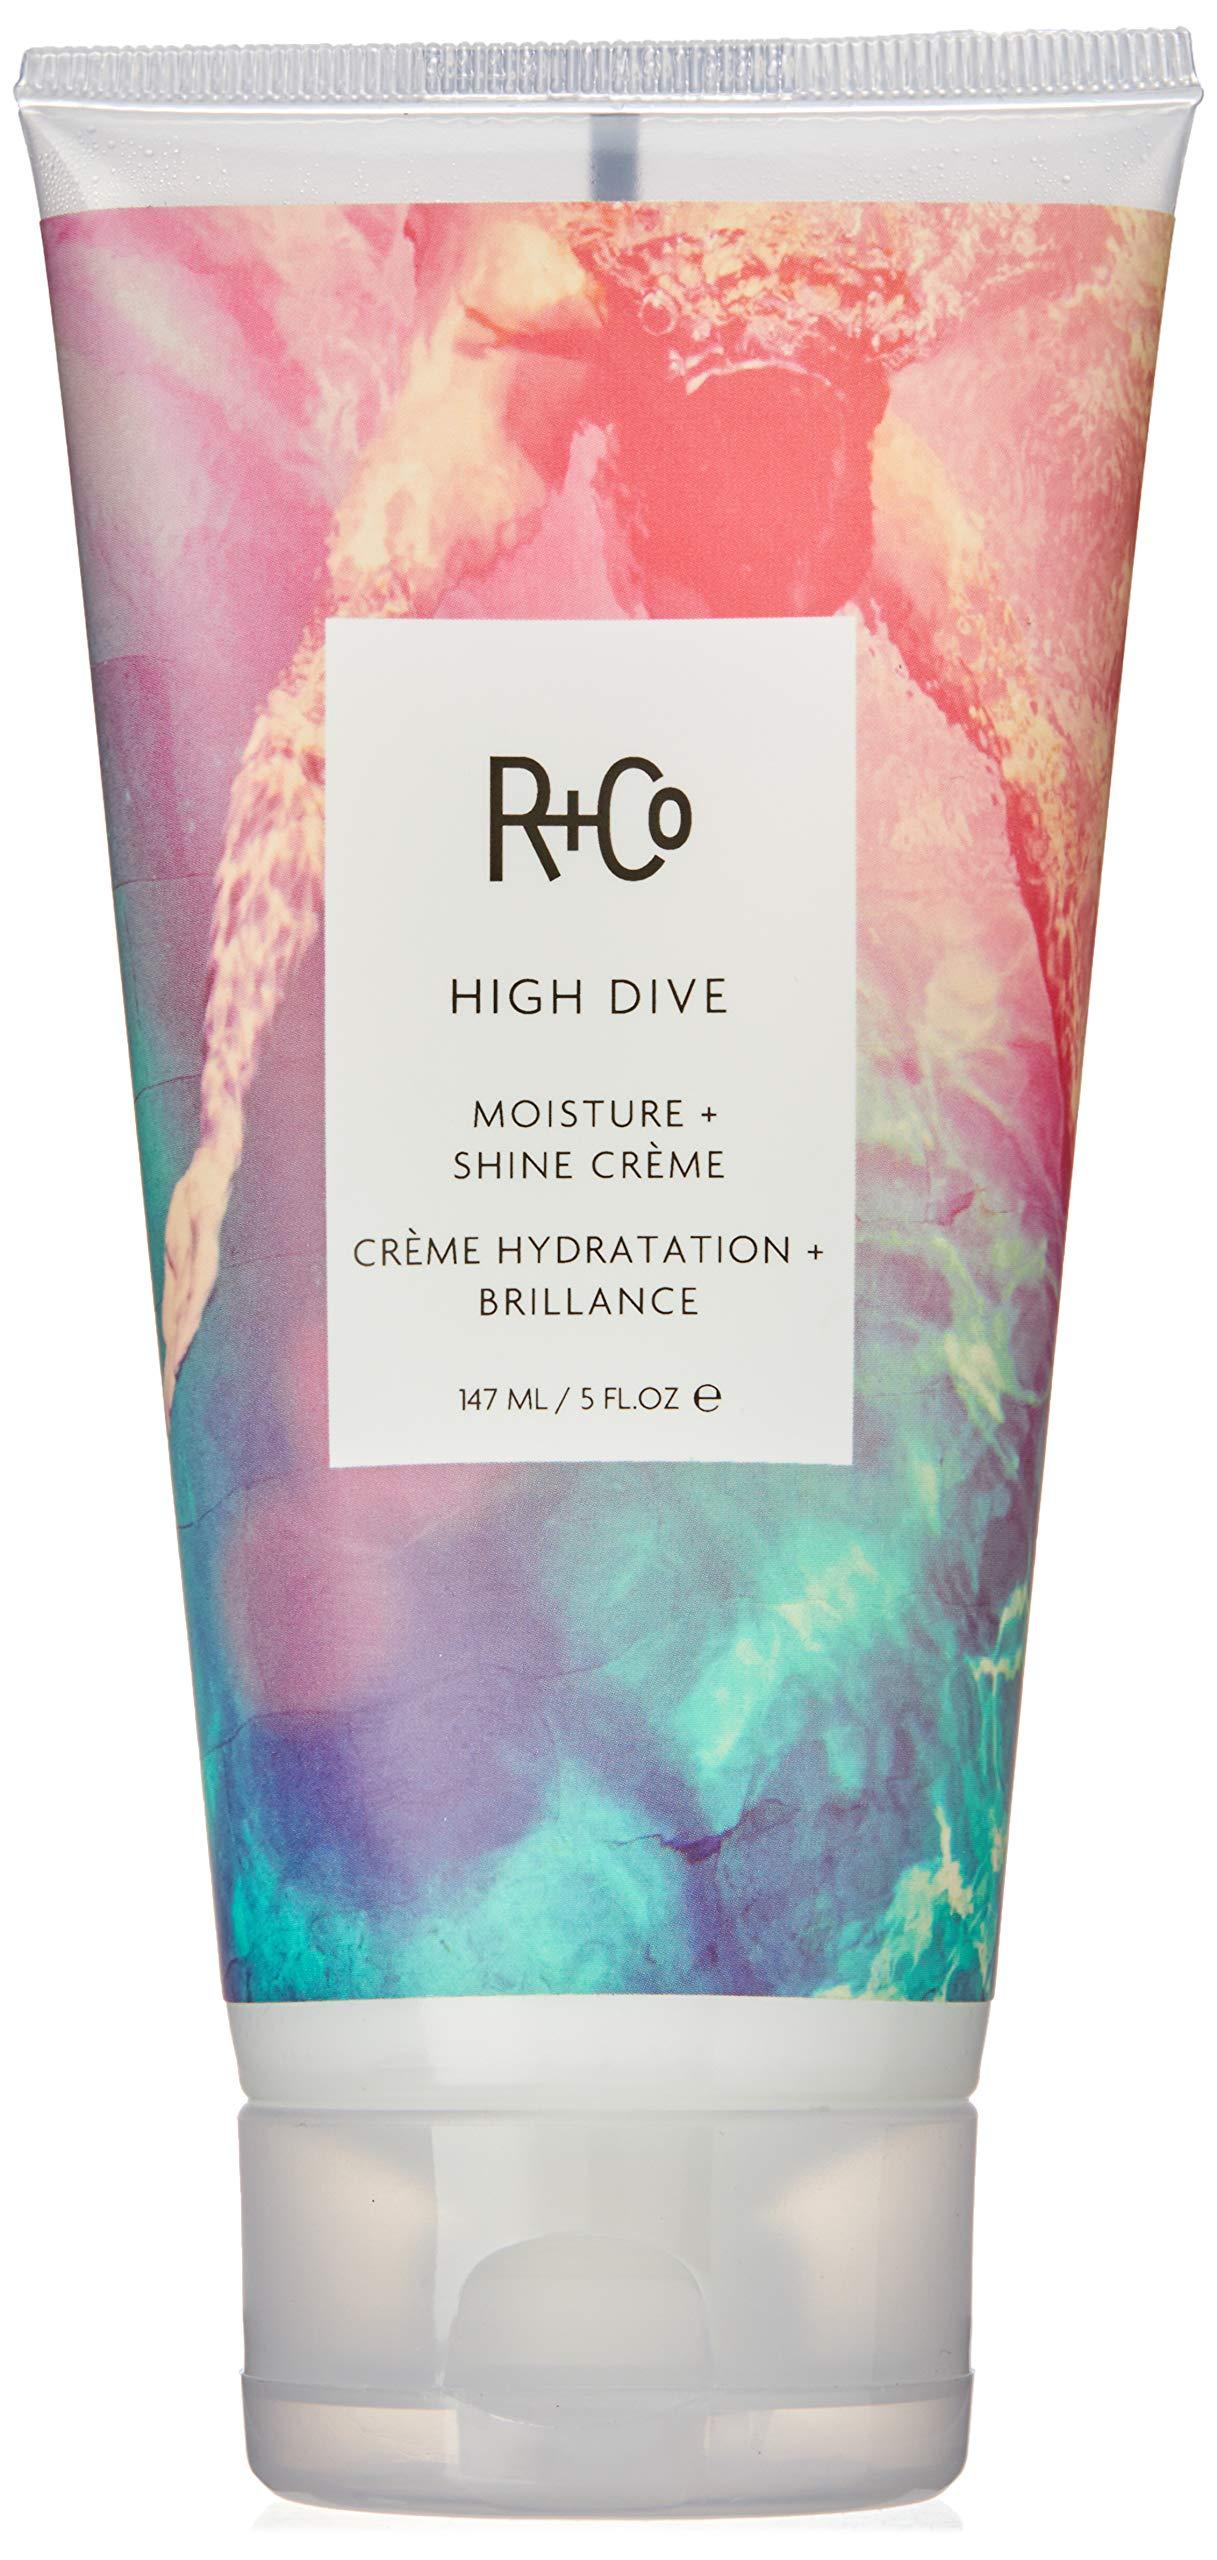 CDM product R+Co High Dive Moisture + Shine Crème big image